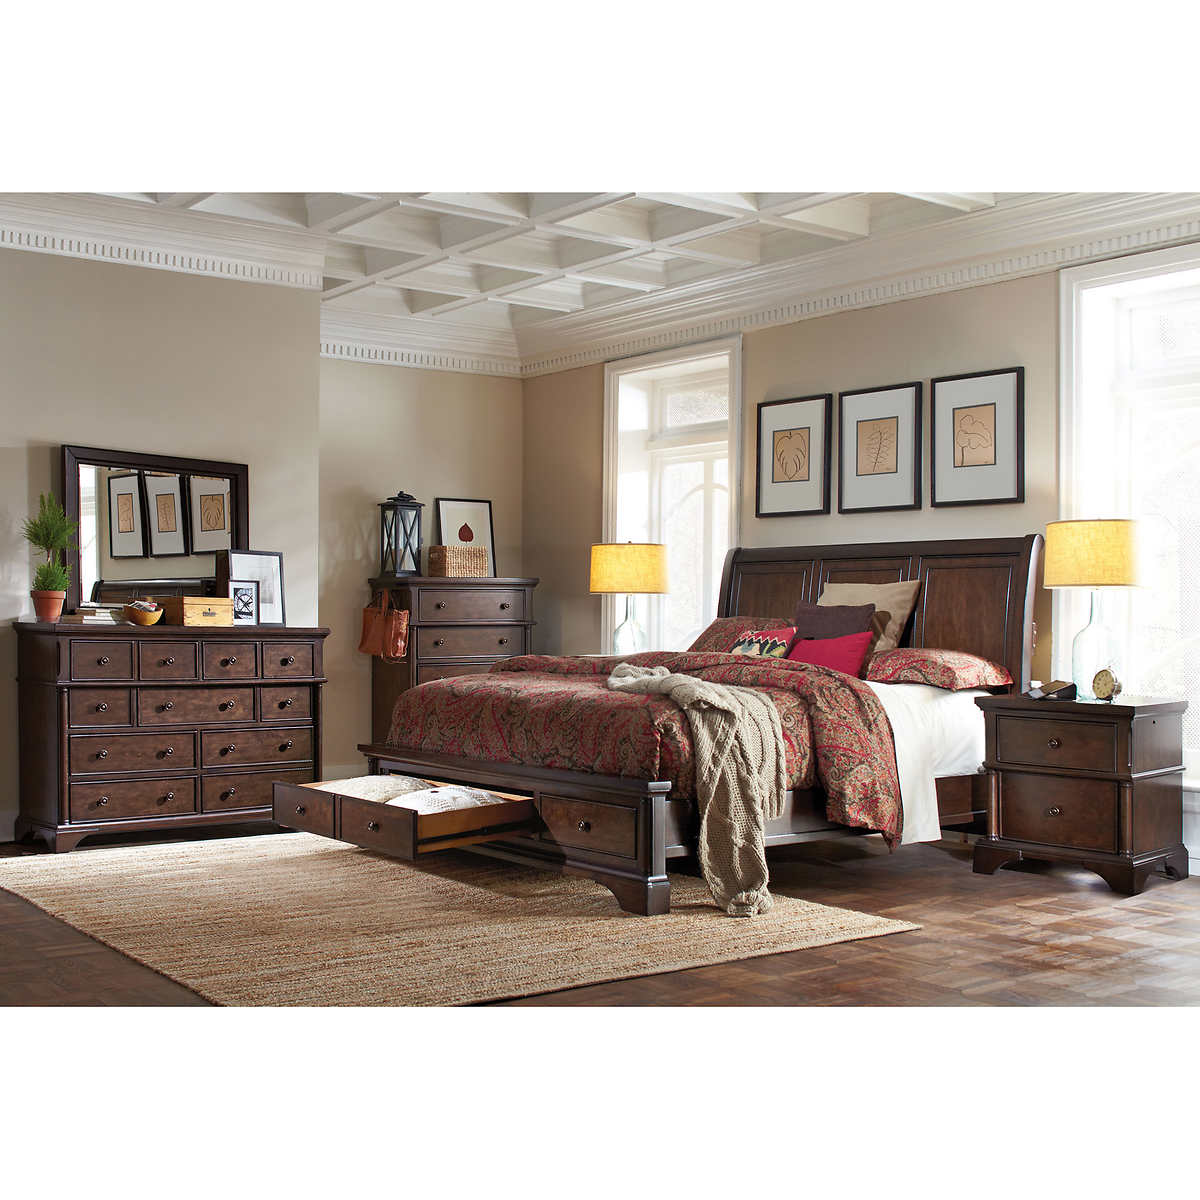 King King Bedroom Sets | Costco